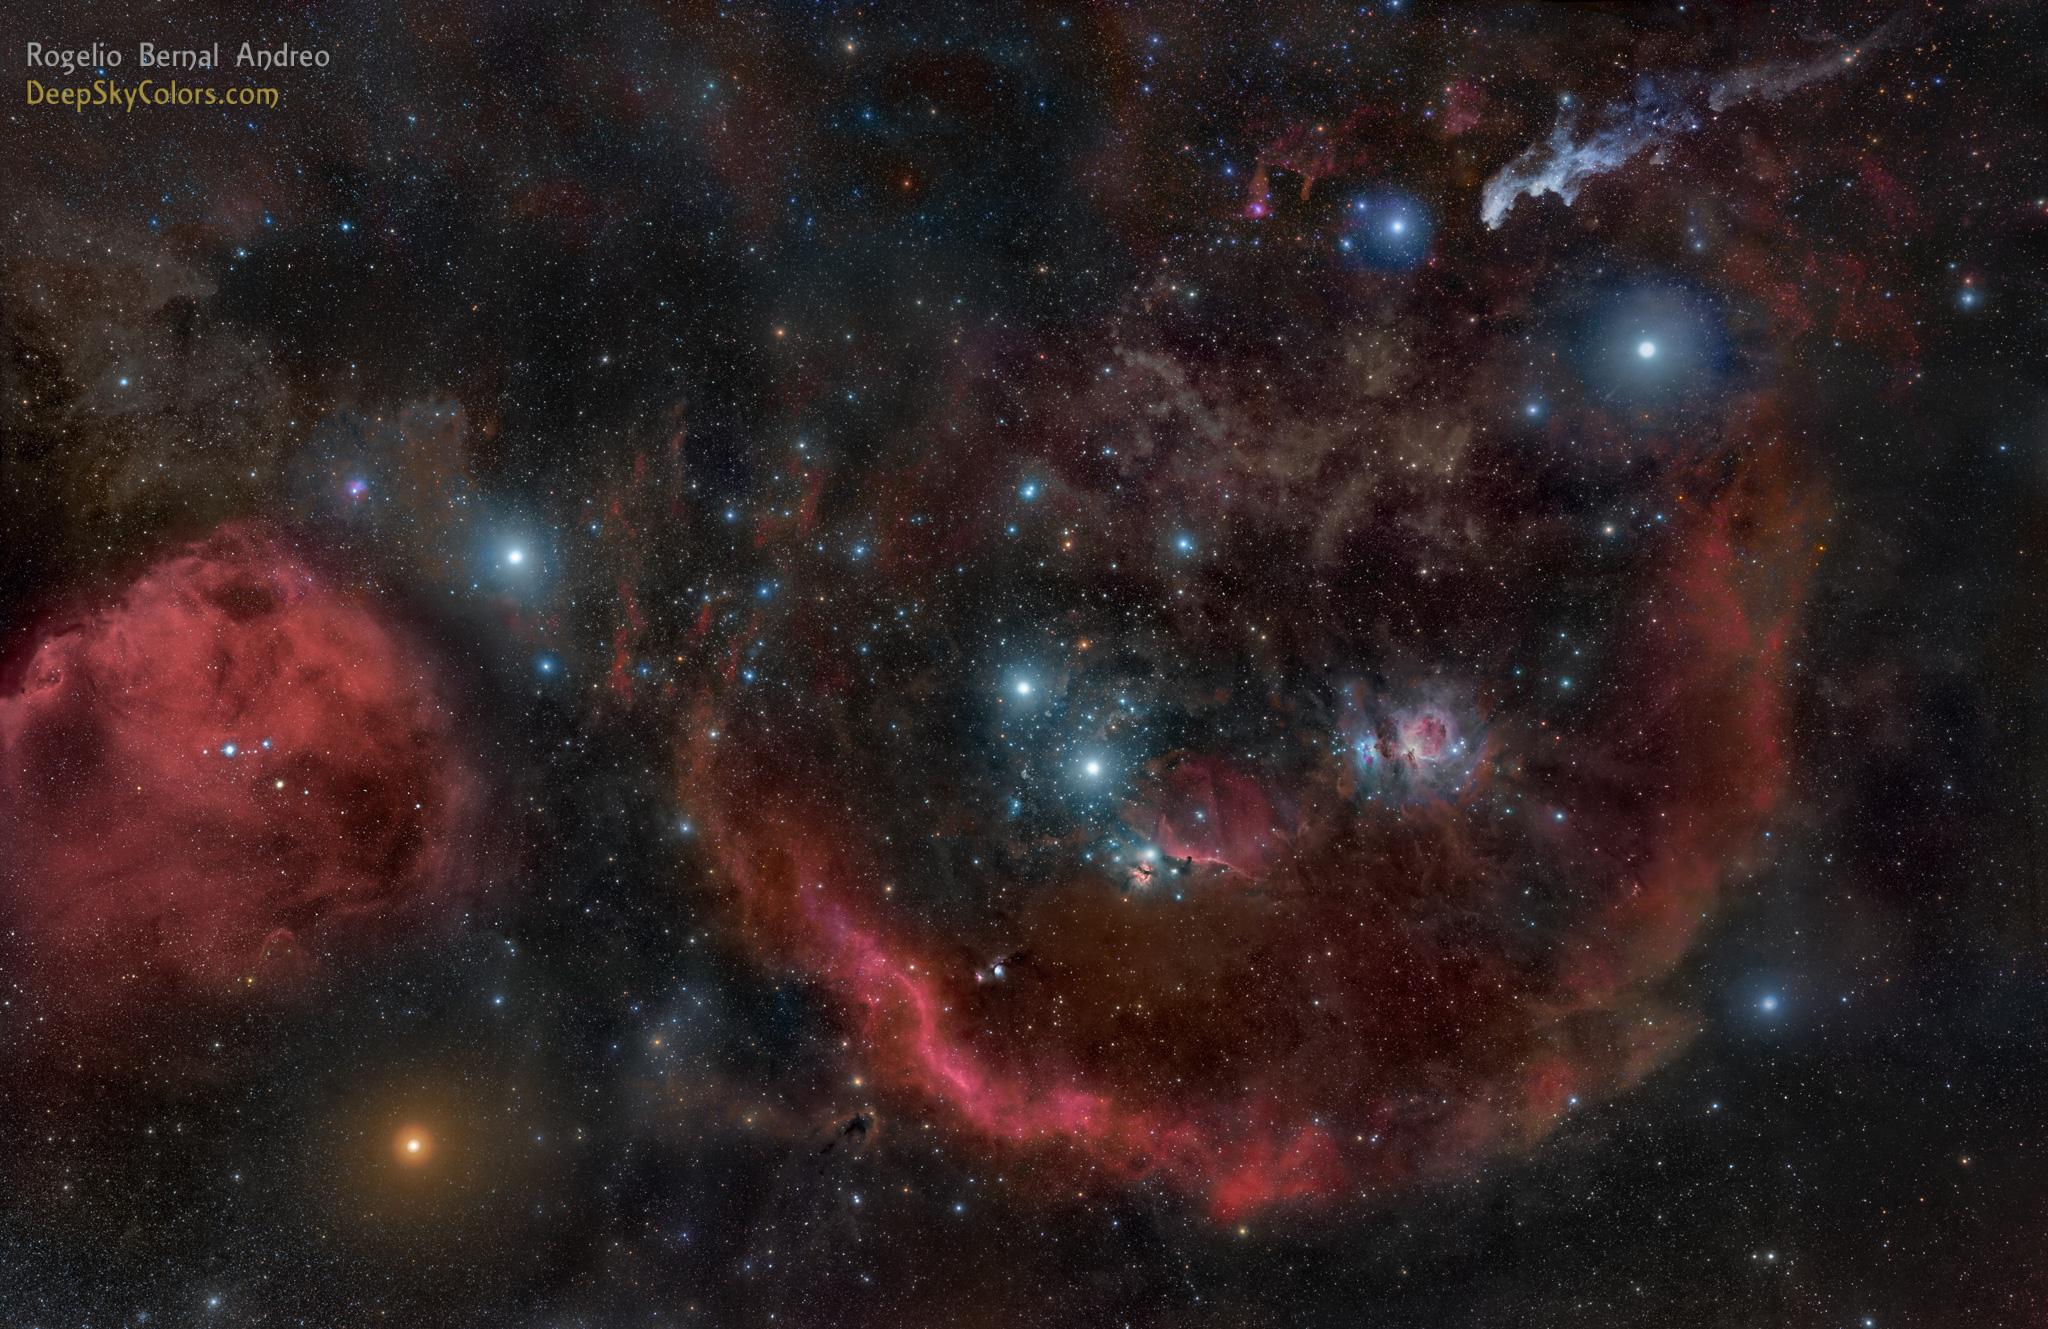 mb_2010-10_OrionWF.jpg.59f43a6ee40068bd0